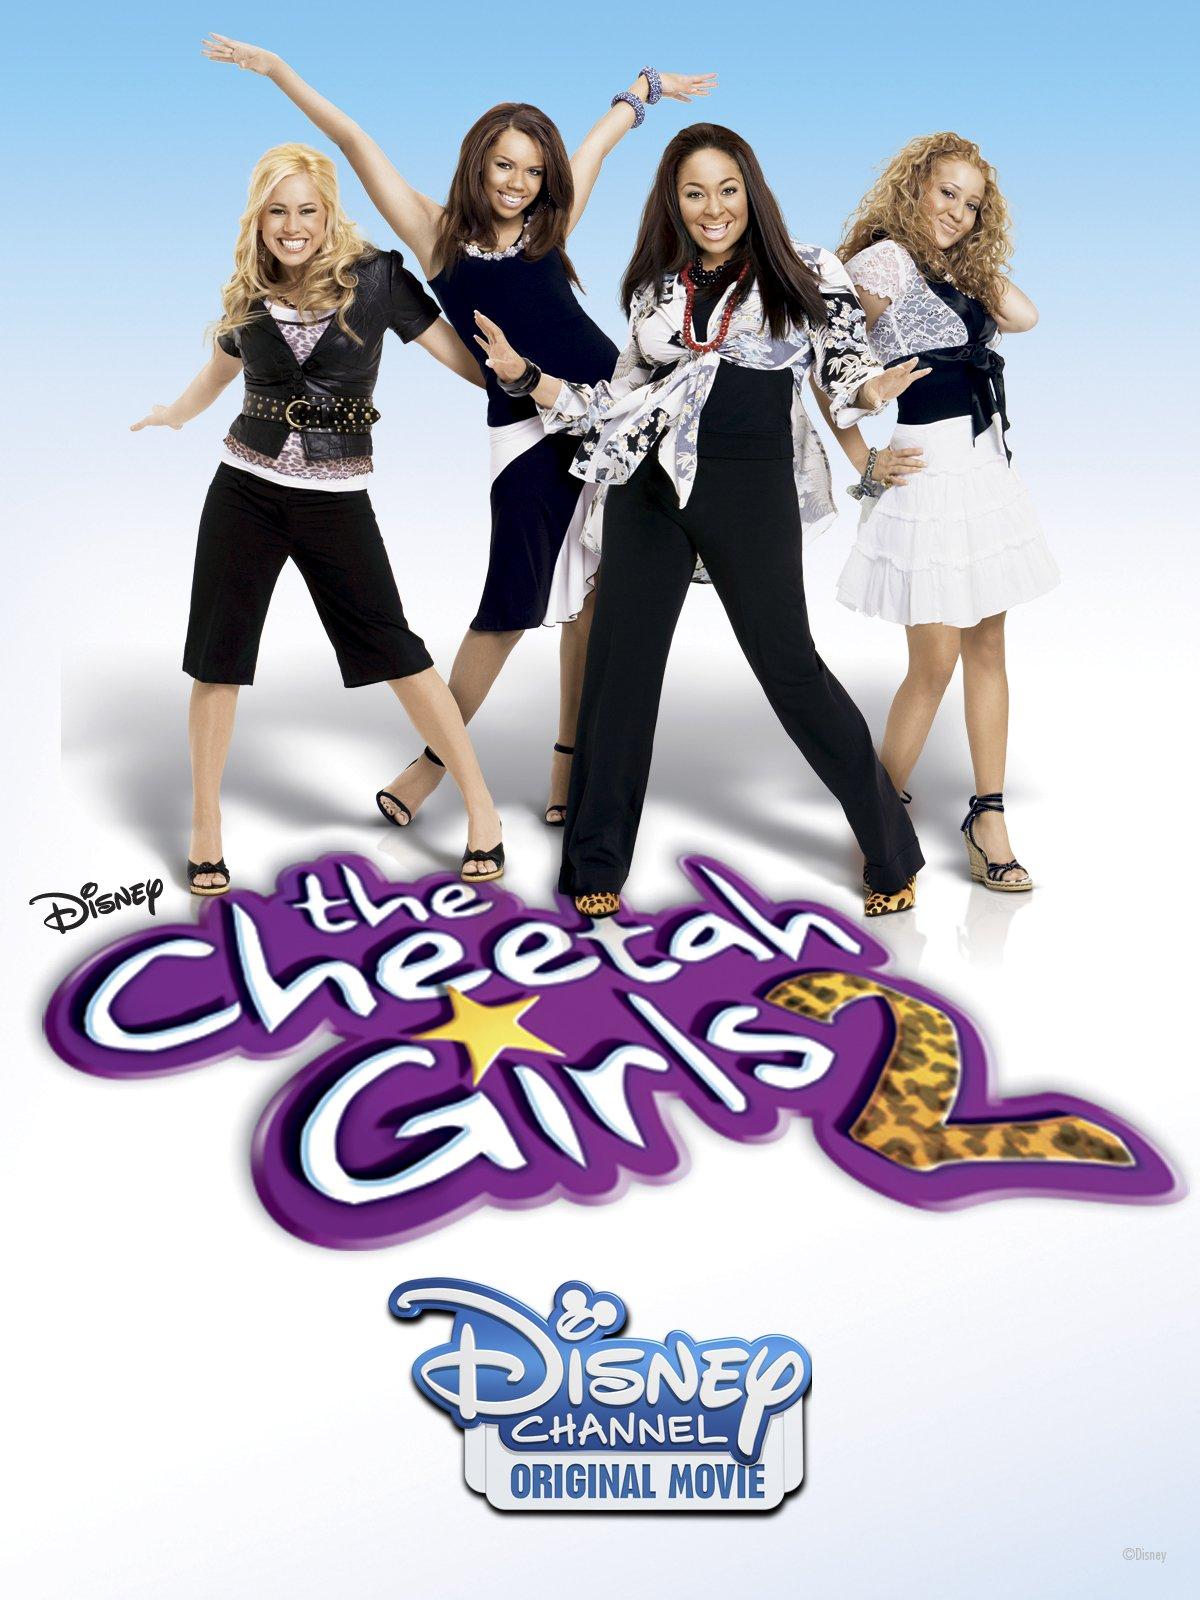 SCARICARE FILM CHEETAH GIRL 2